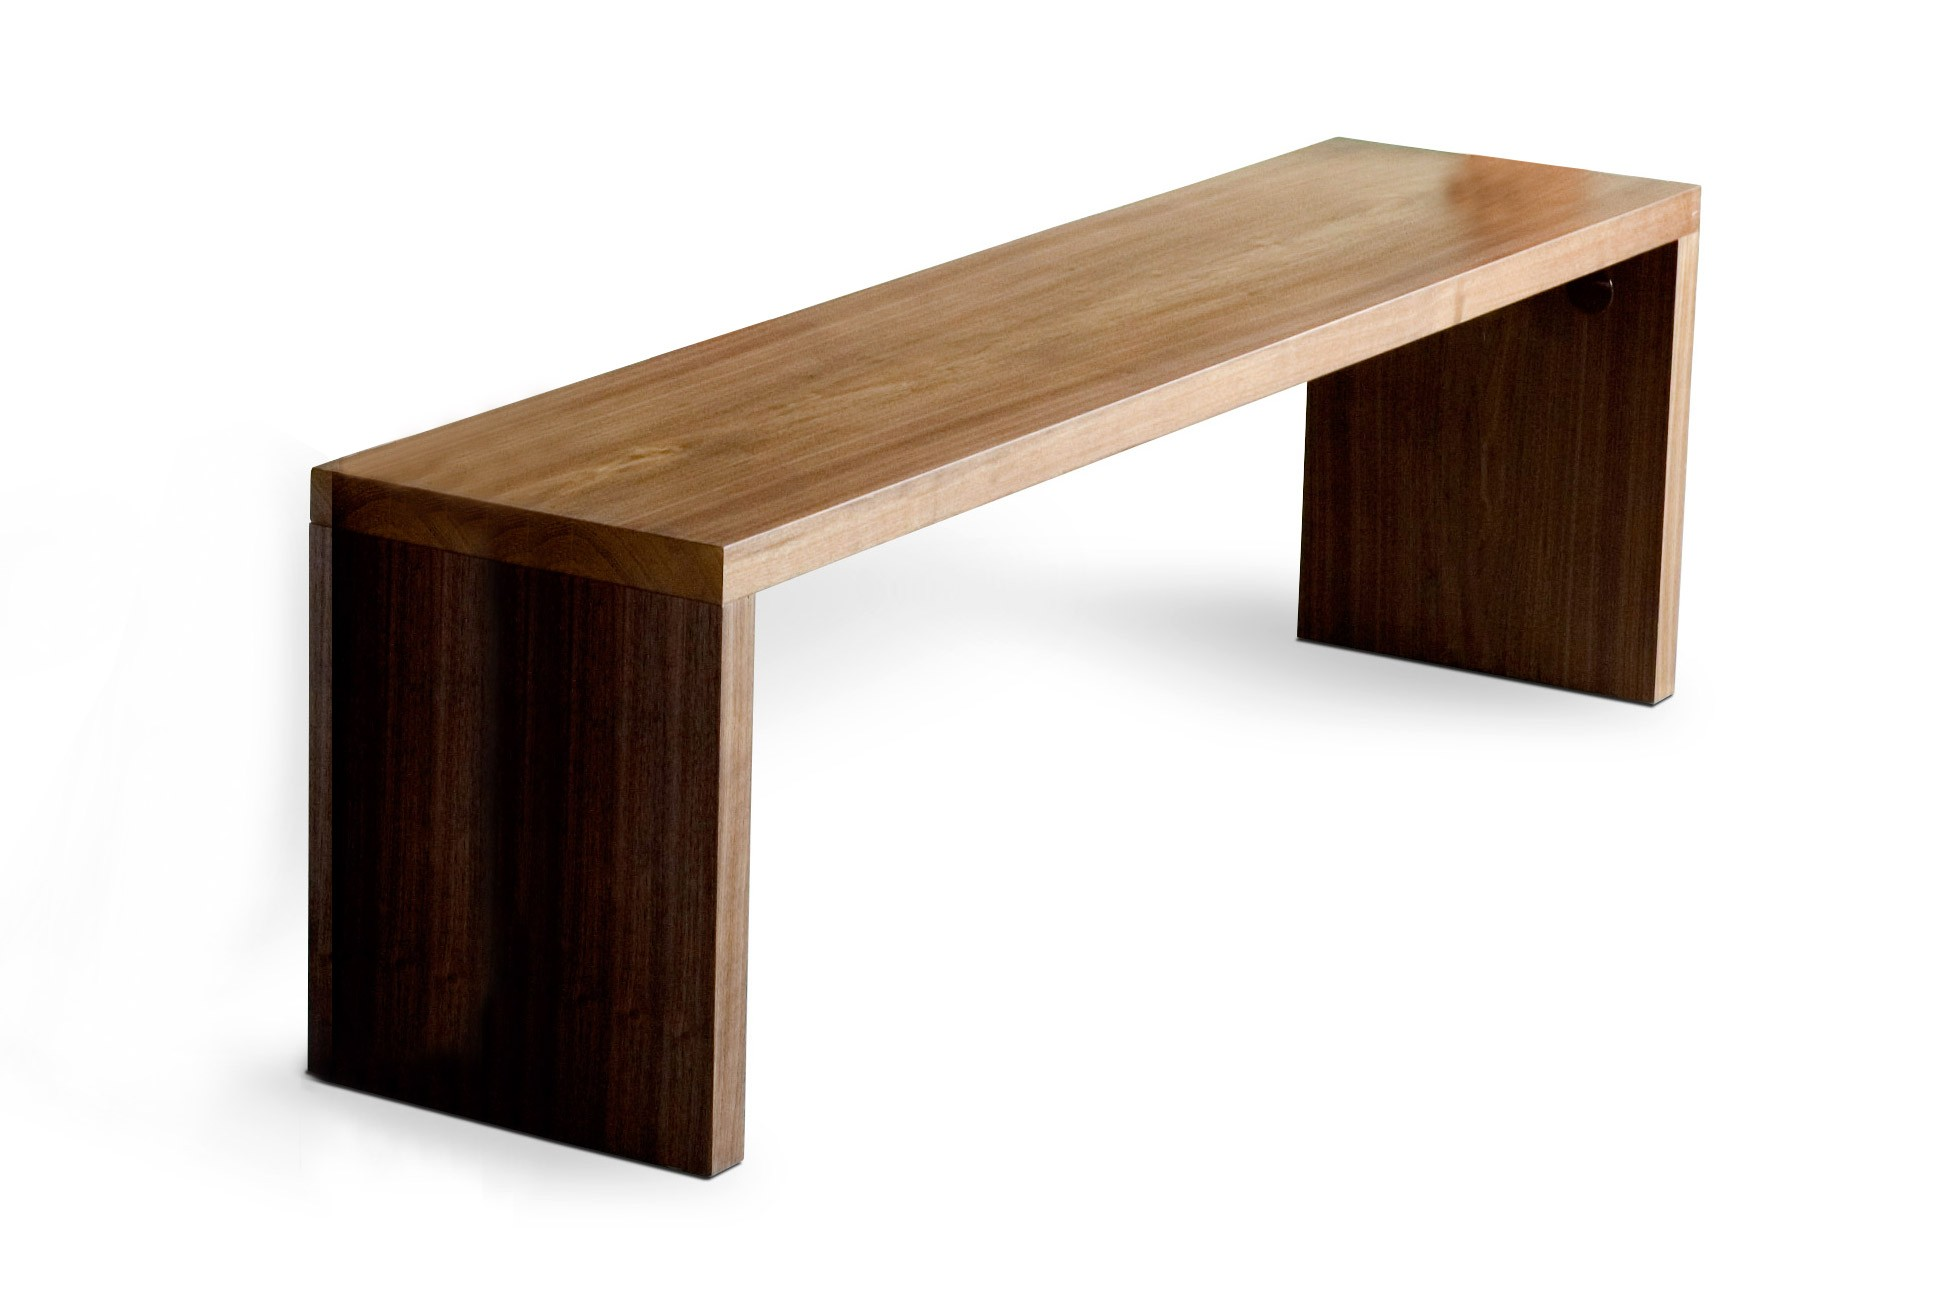 Plank Bench Hip